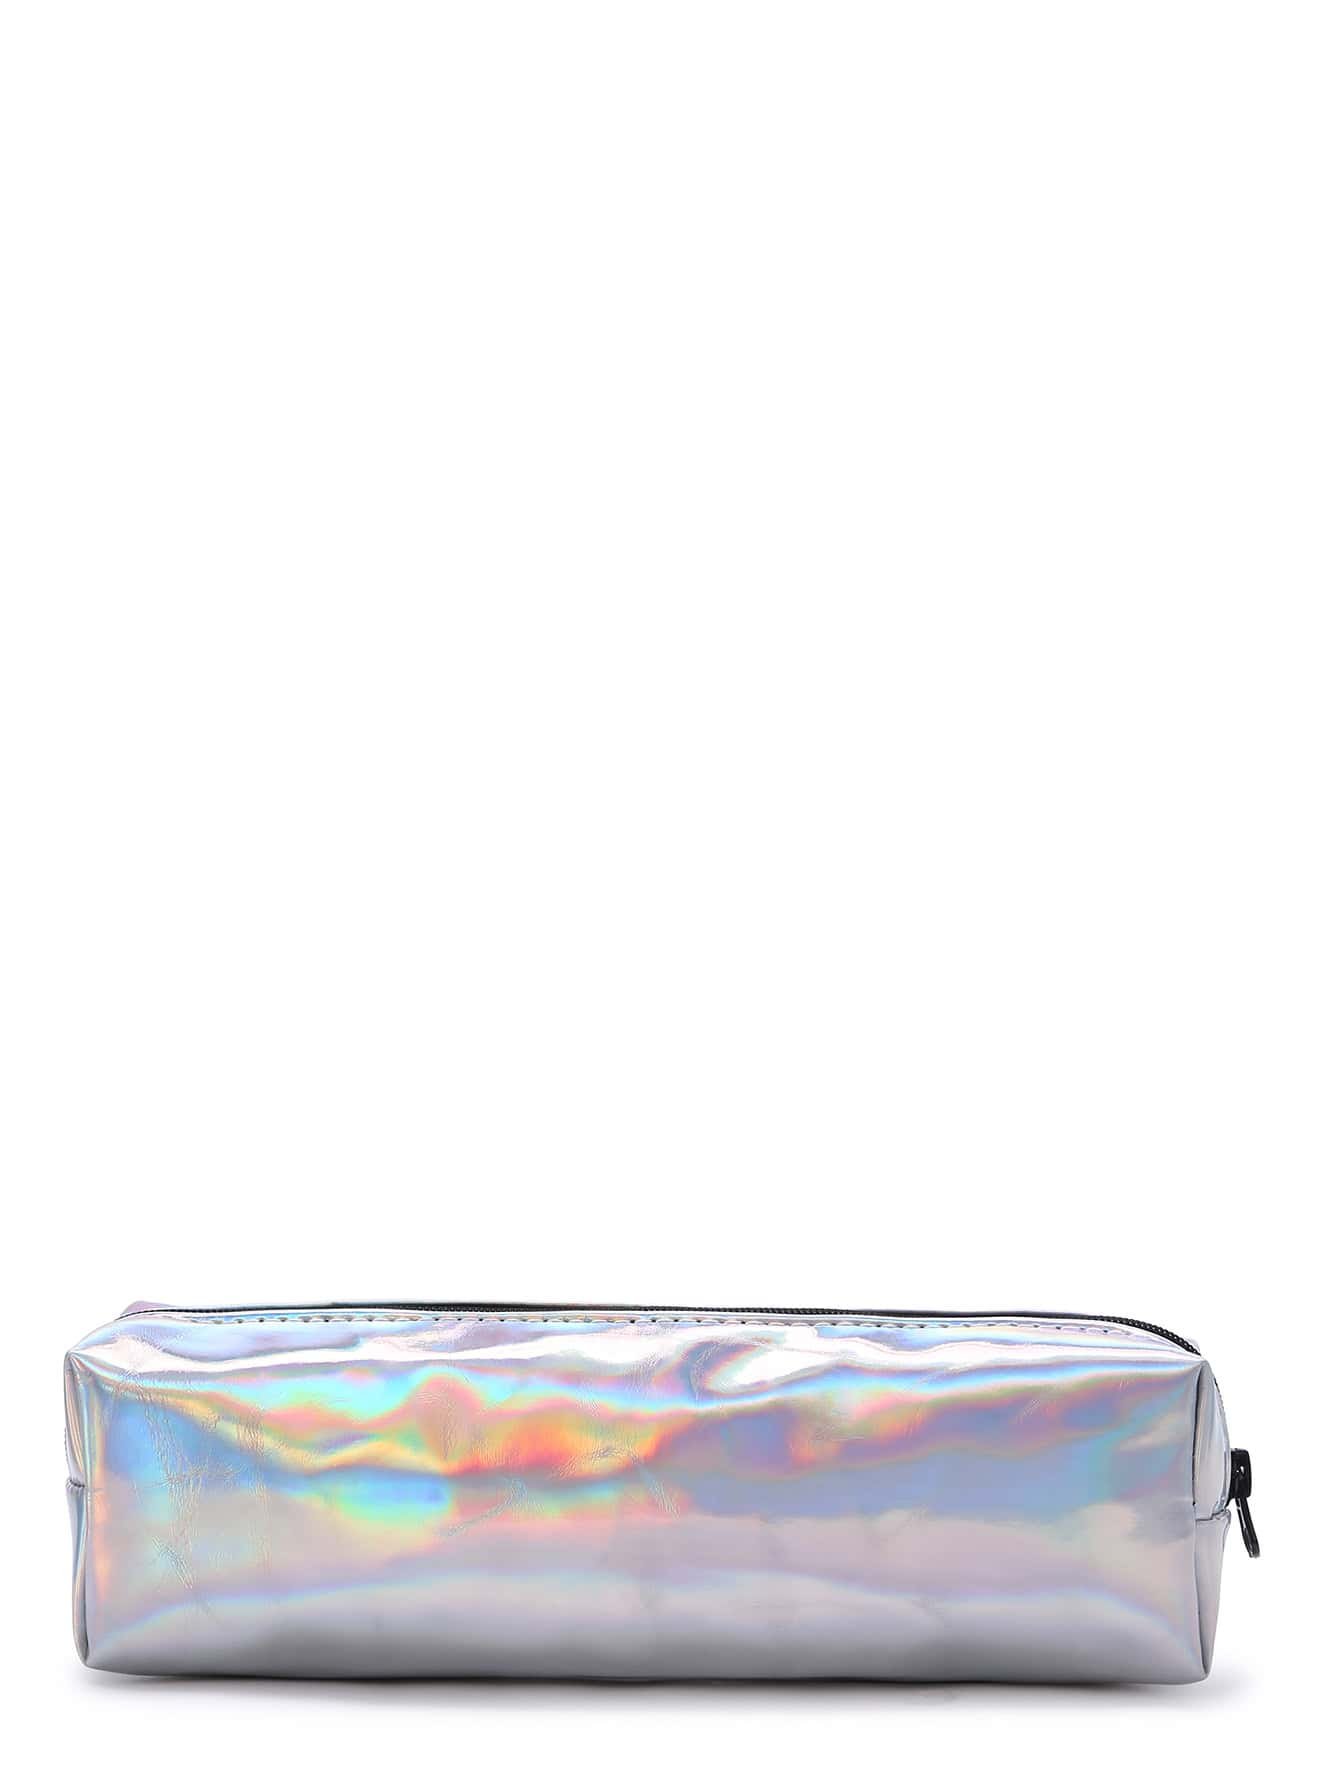 Bright Silver Makeup Case -SheIn(Sheinside)